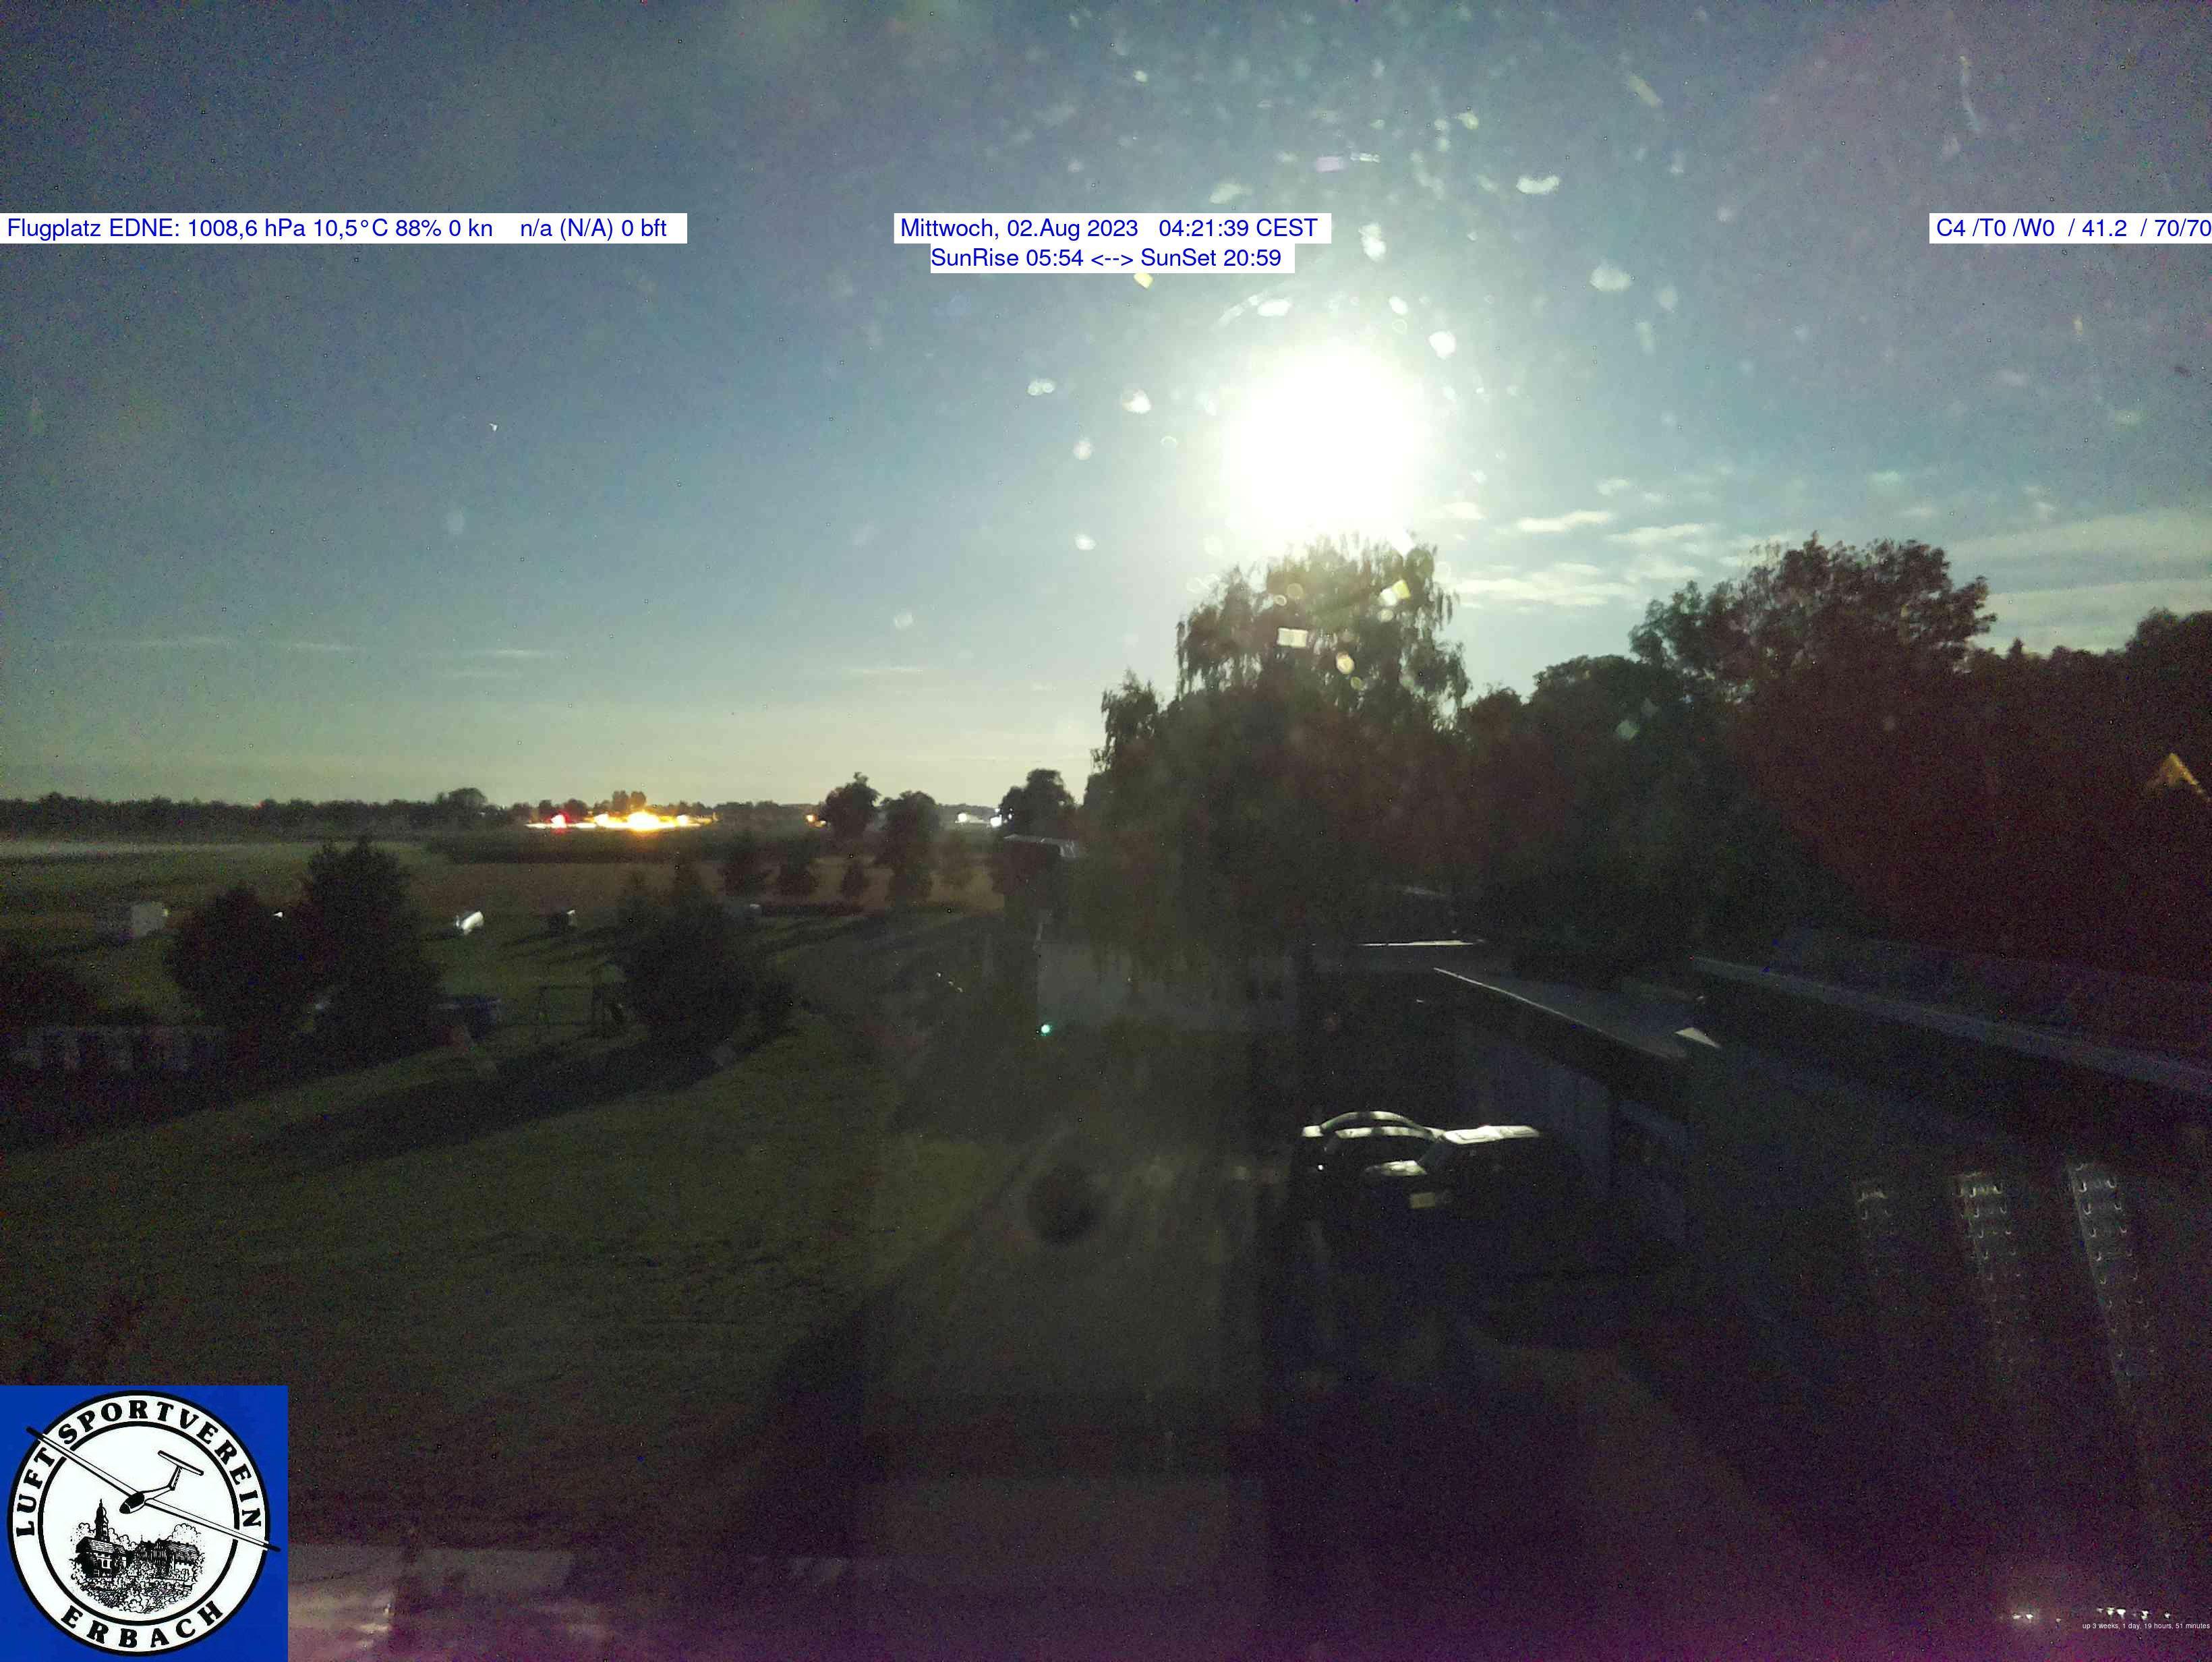 Erbach Flugplatz EDNE SW